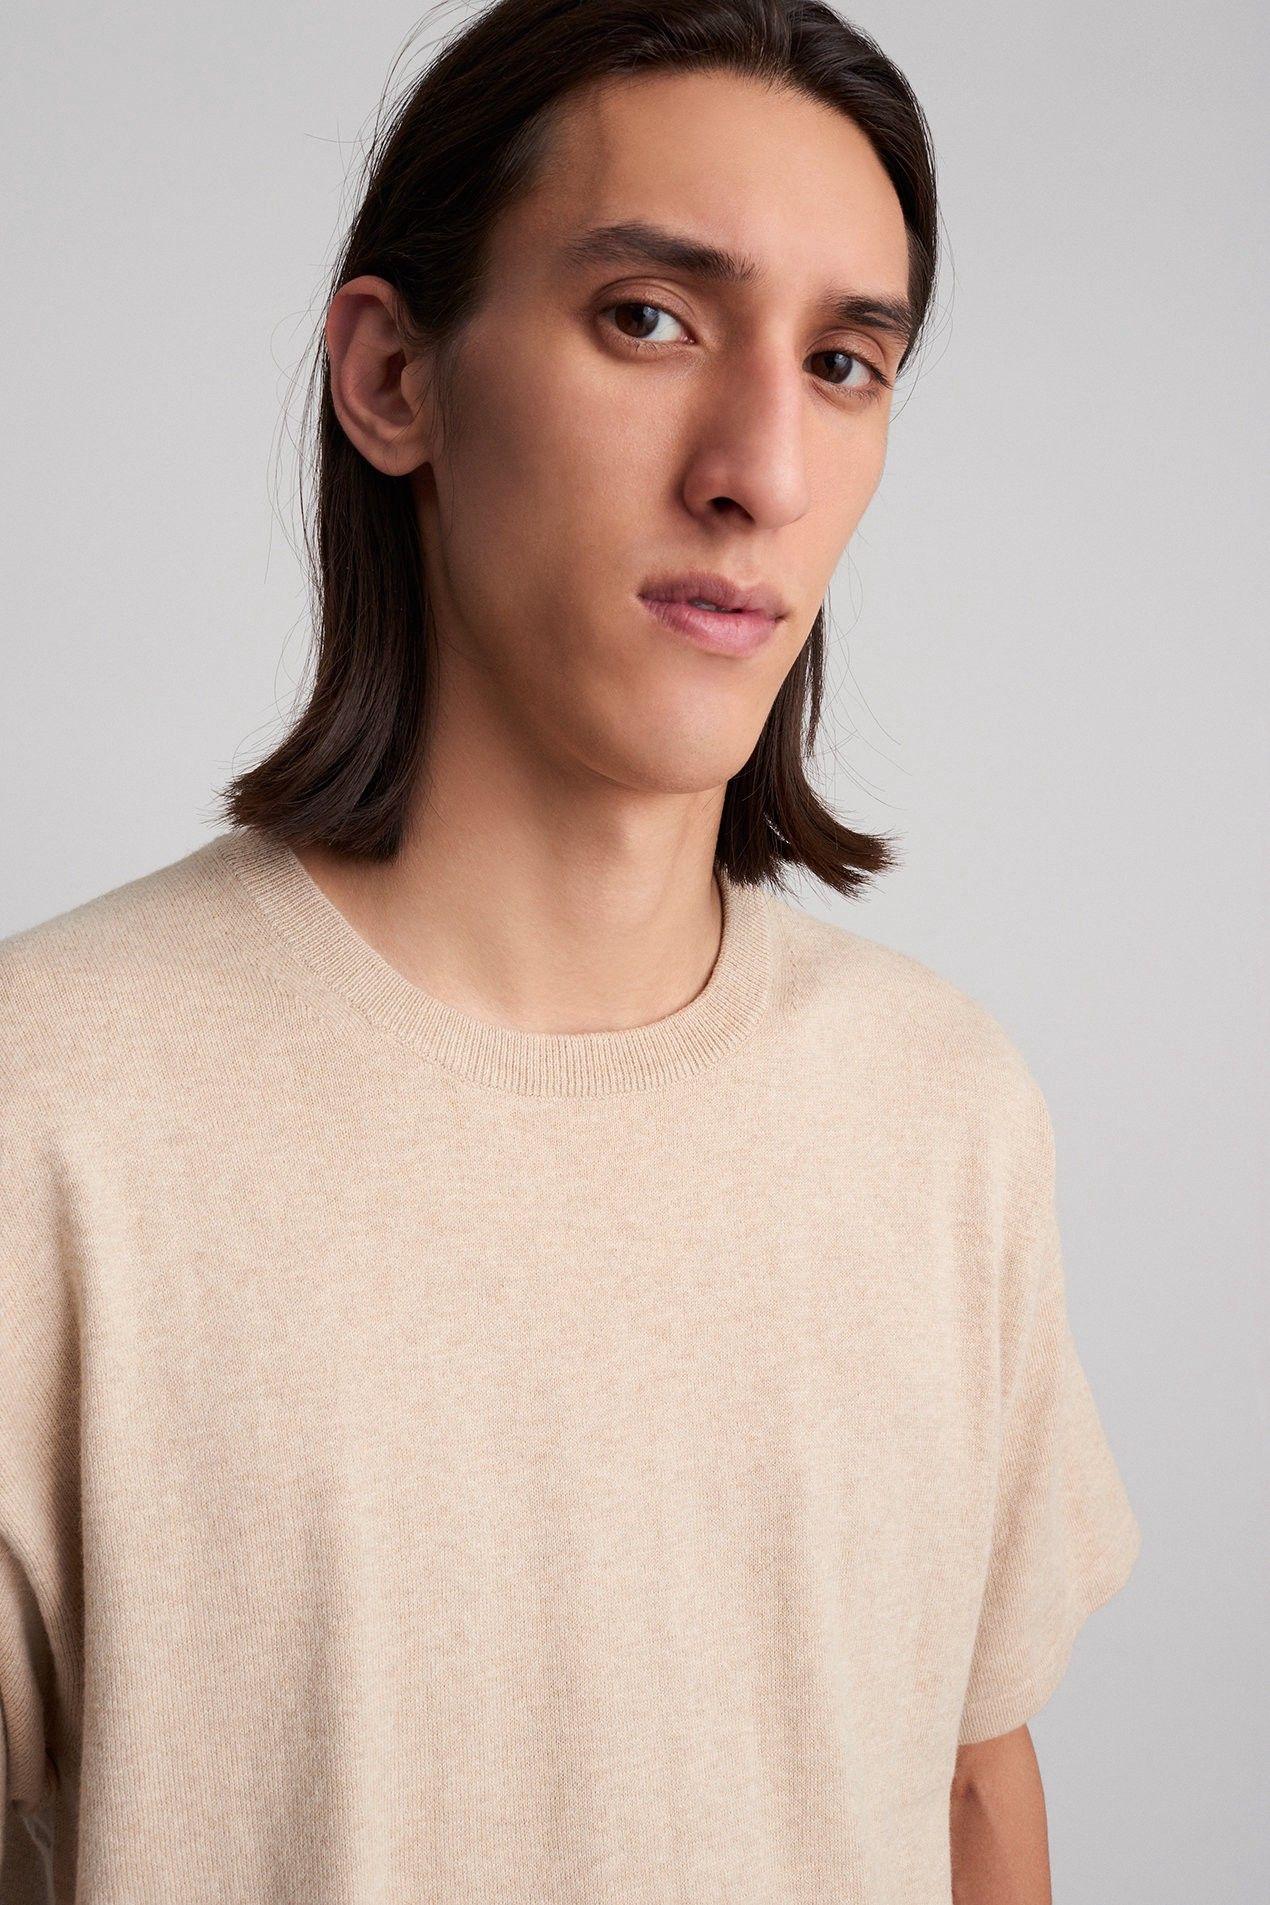 ef185a2536b2 Saturdays Nyc Pacho Short Sleeve Sweater British Khaki - XL ...